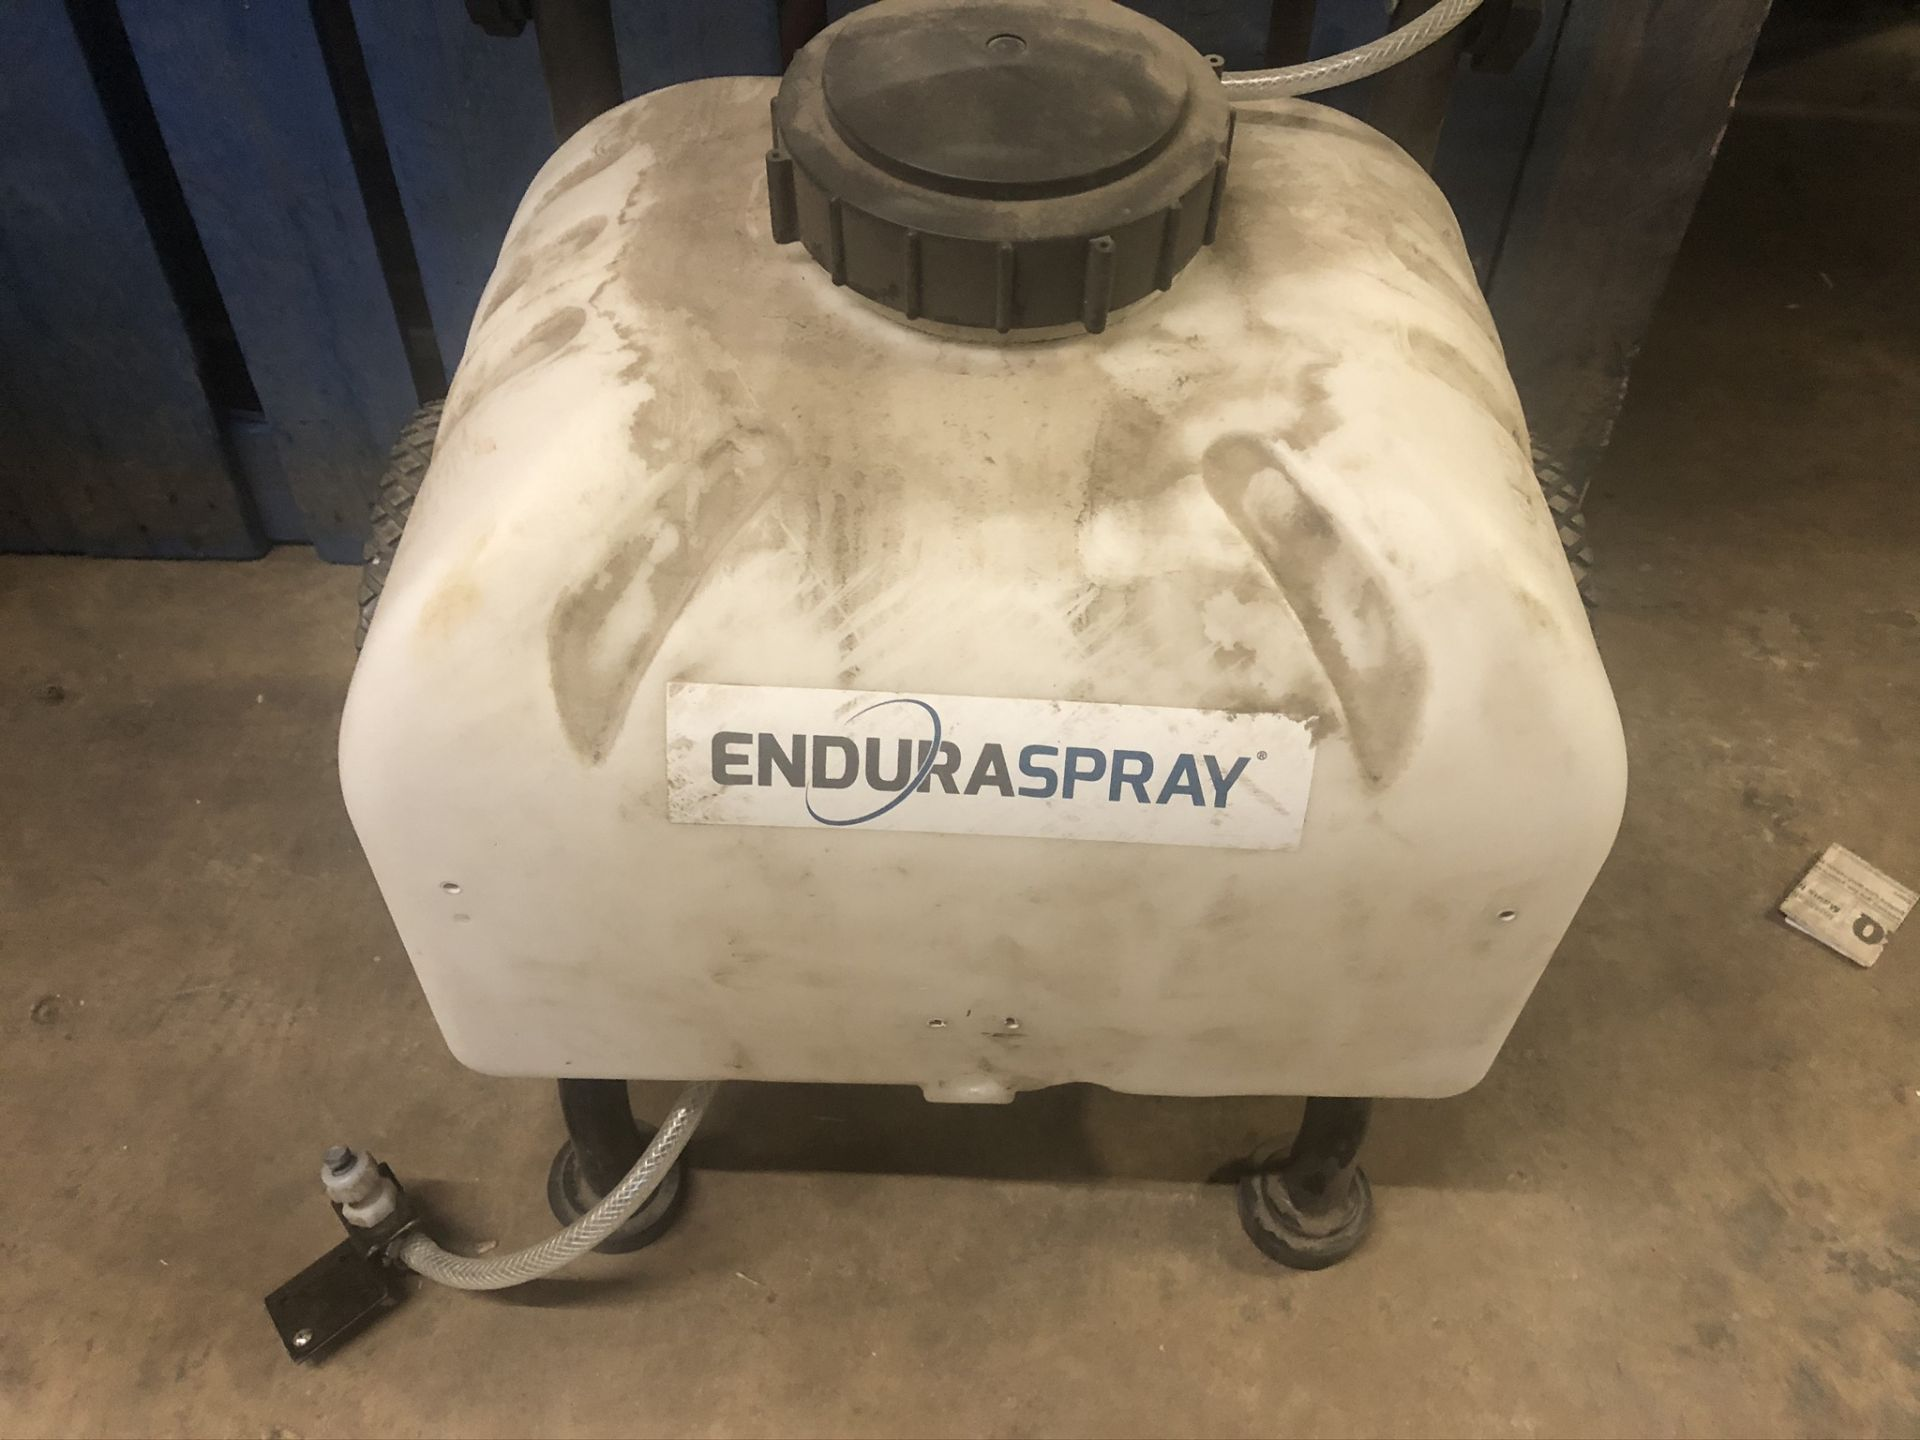 Lot 27 - Enduraspray Push Along Sprayer